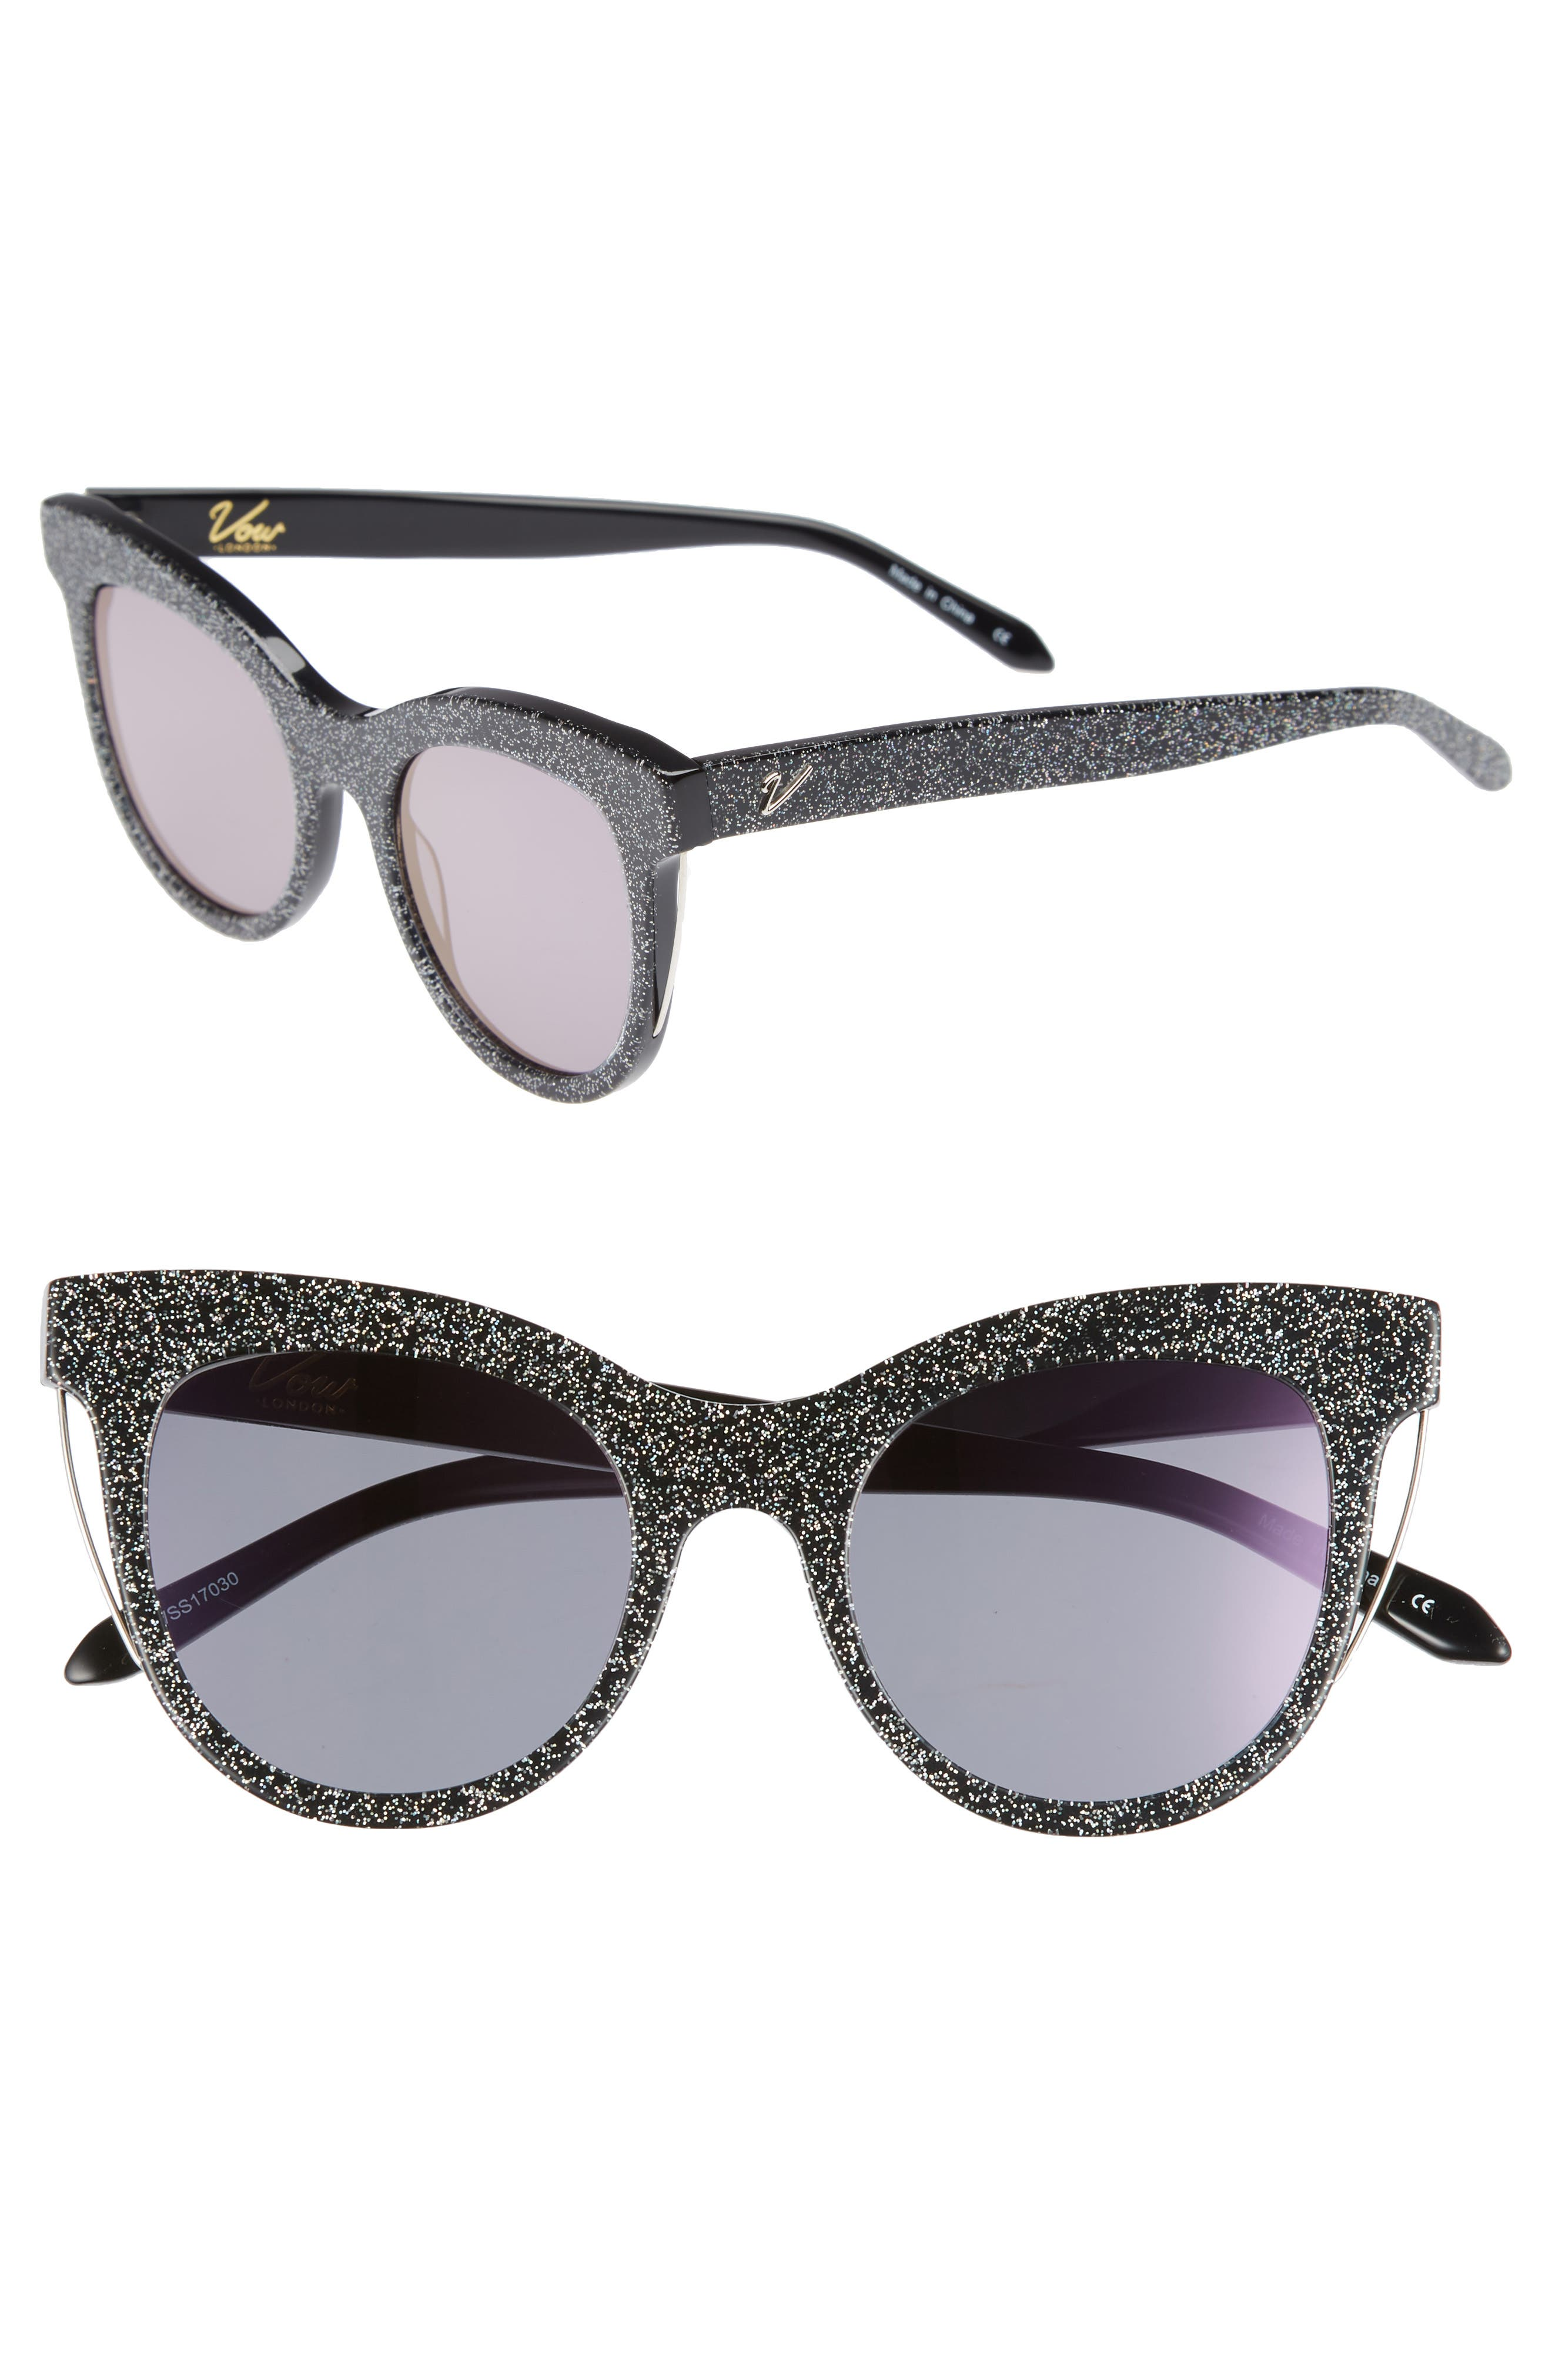 Sloane 52mm Cat Eye Sunglasses,                         Main,                         color, MULTI GLITTER/ PURPLE FLASH